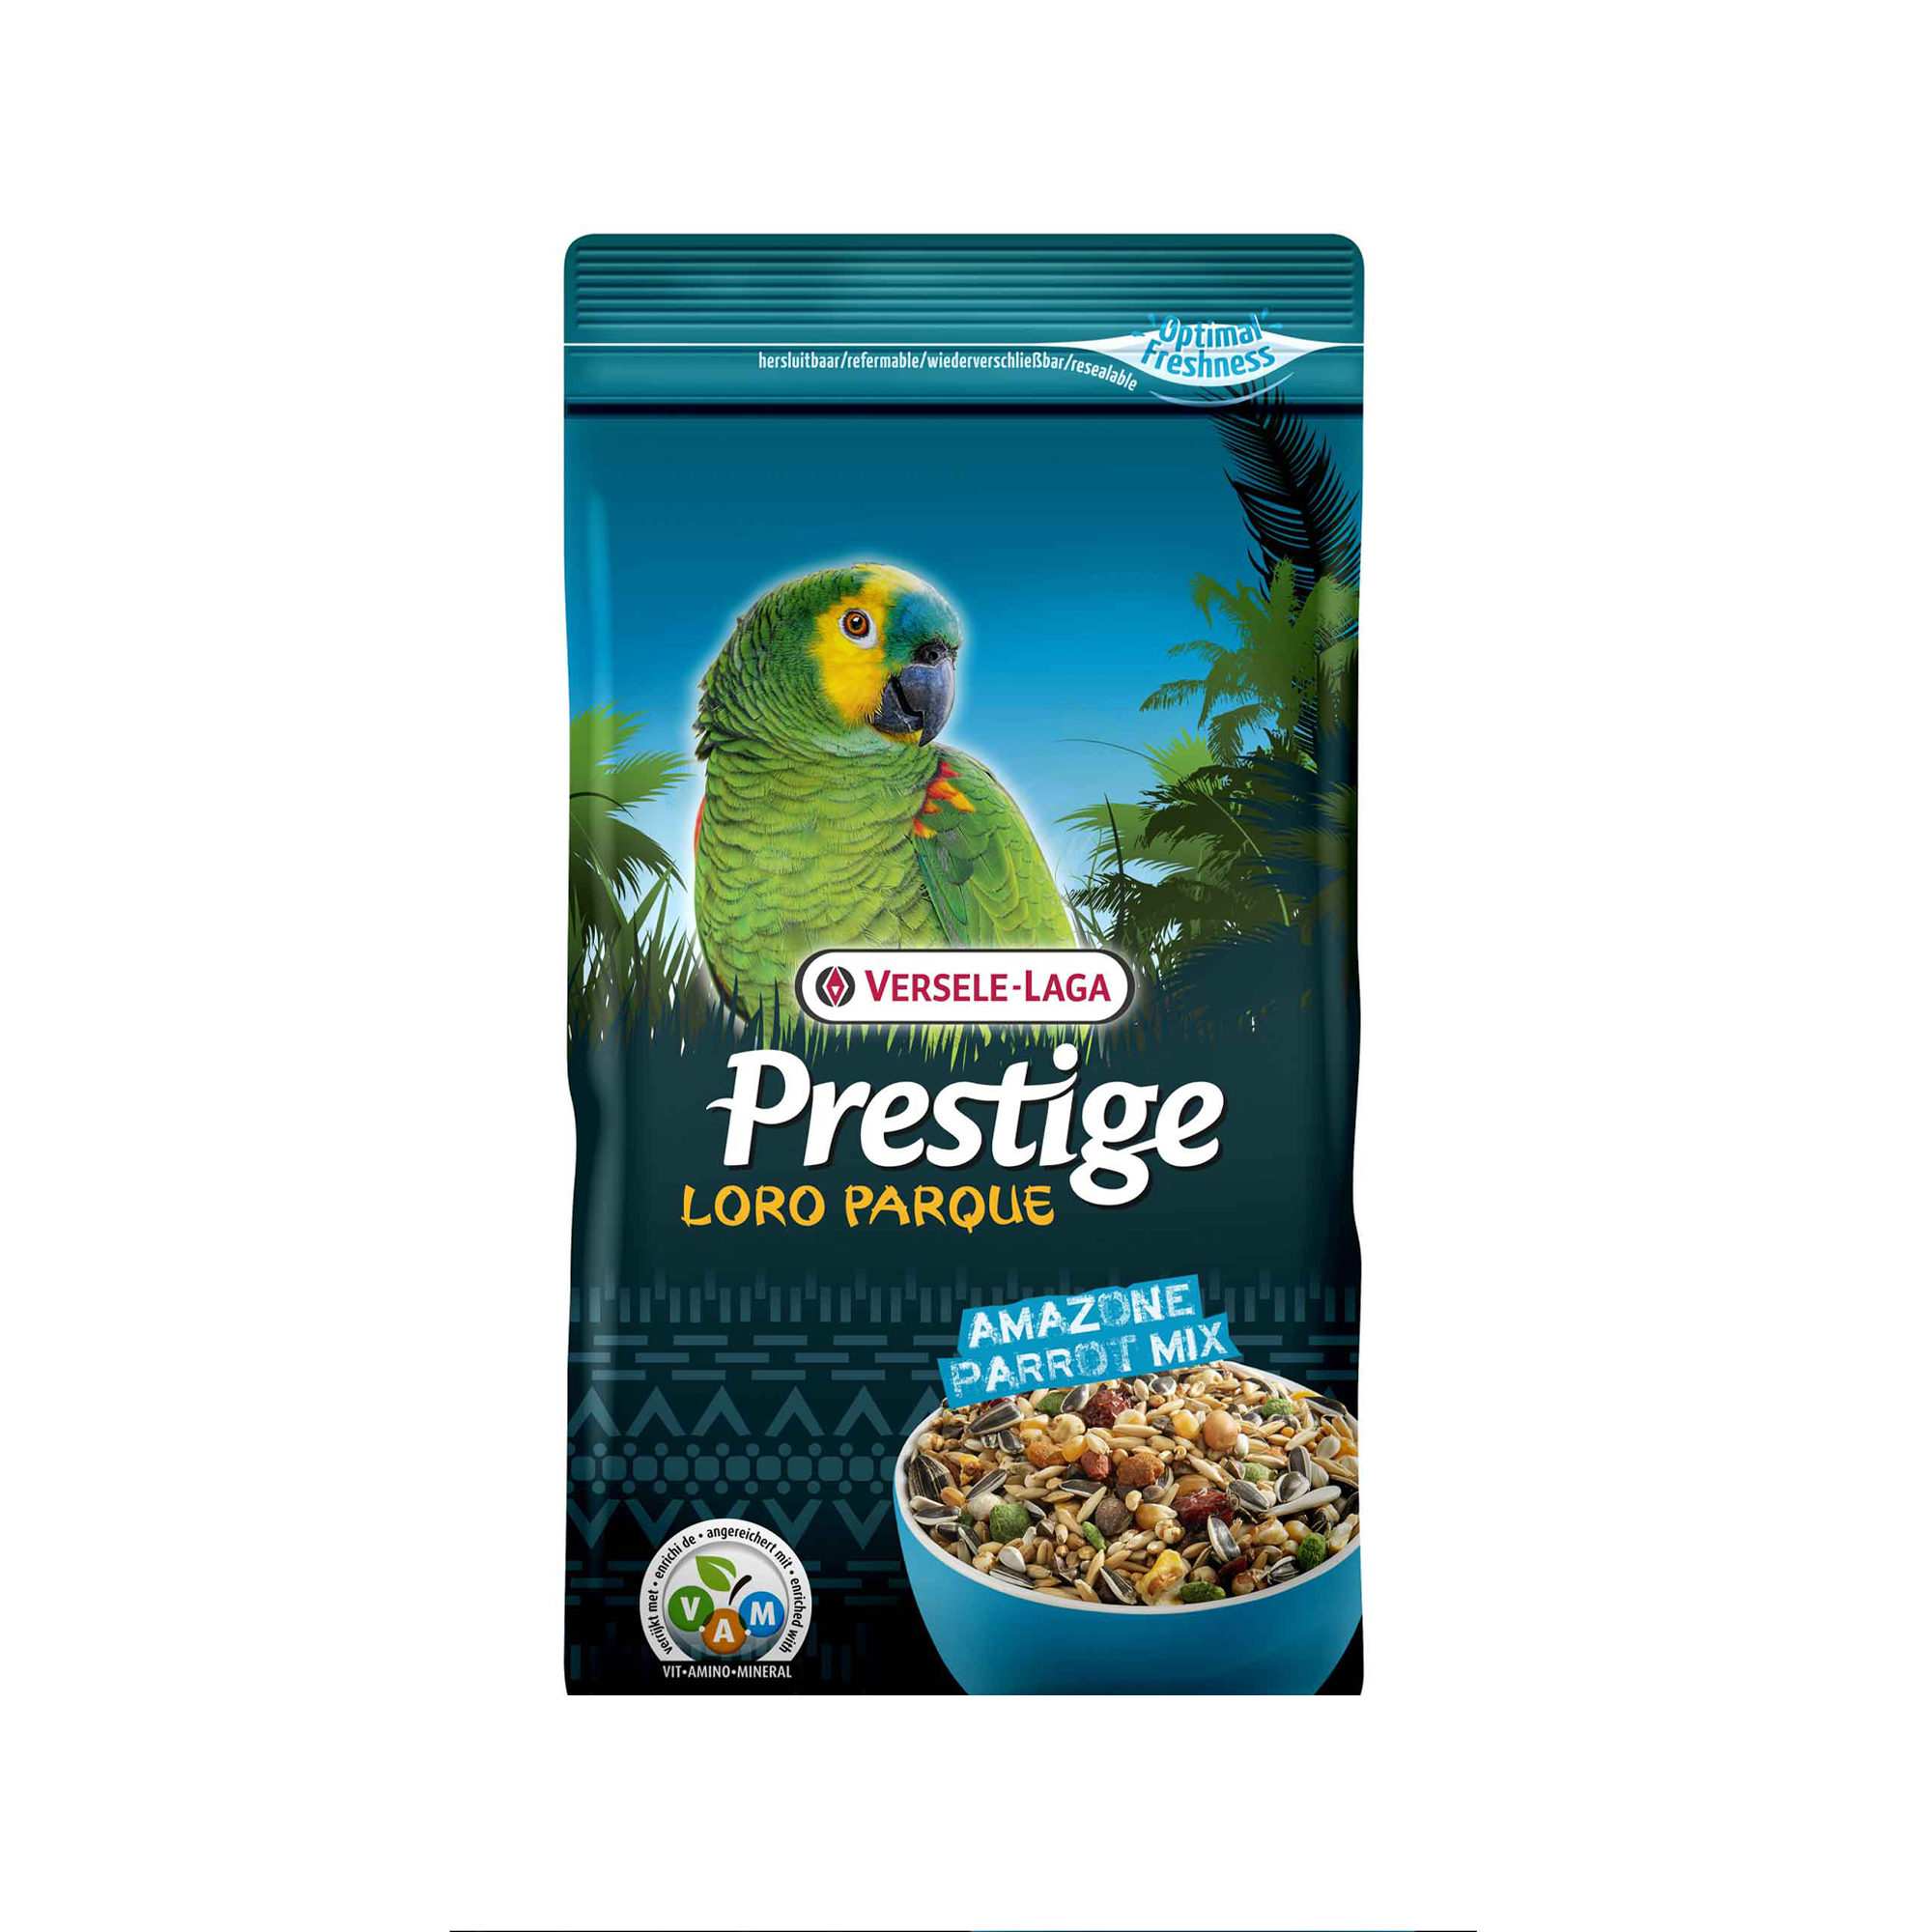 Versele-Laga Prestige Loro Parque Amazone Parrot Mix